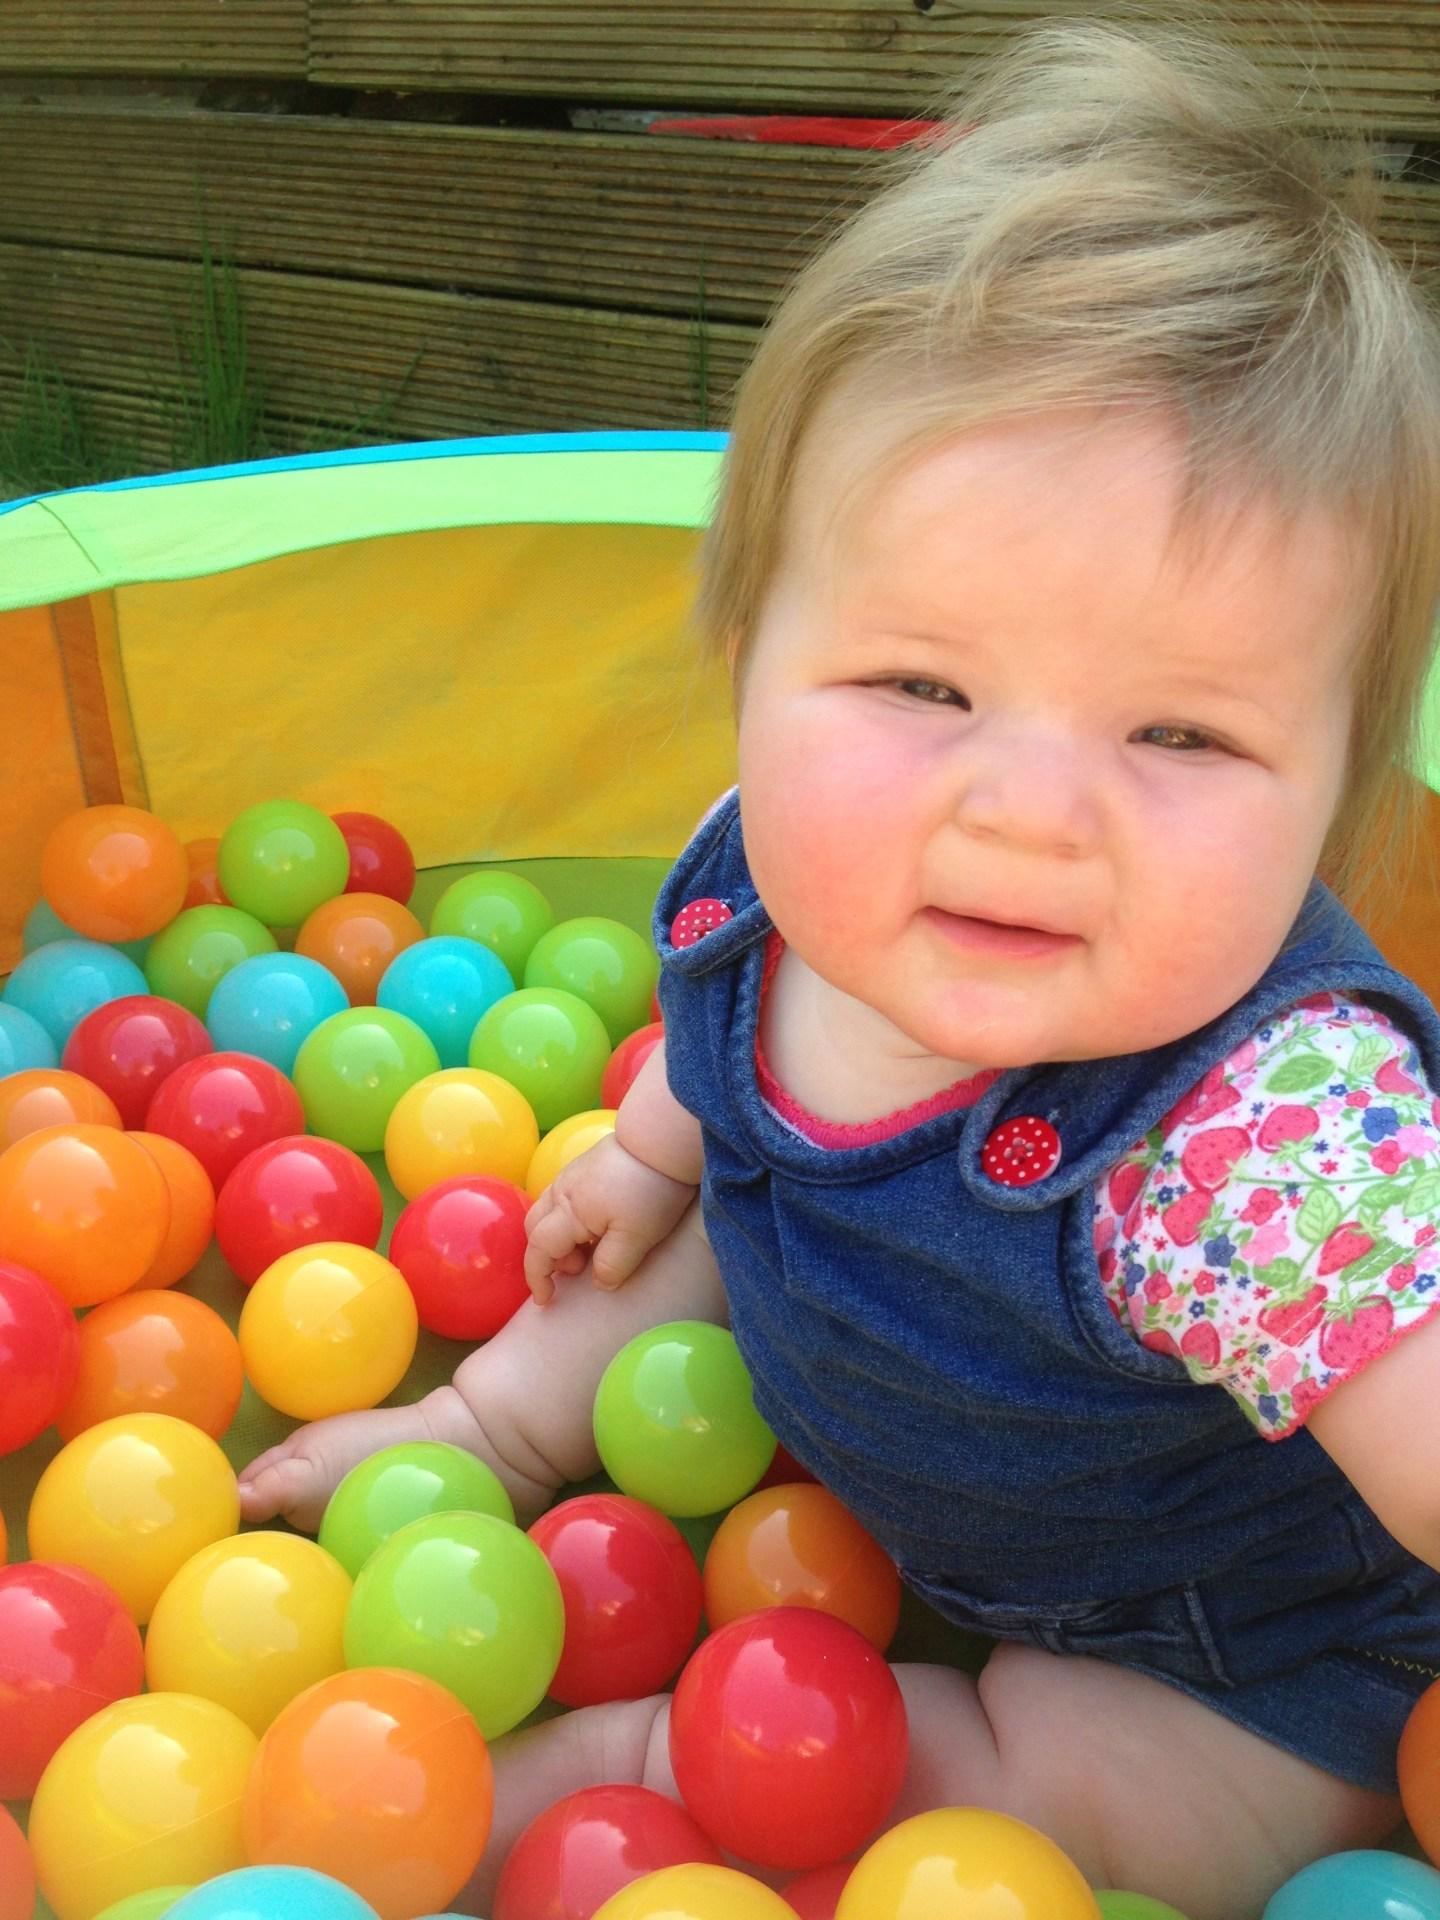 Baby ball pool